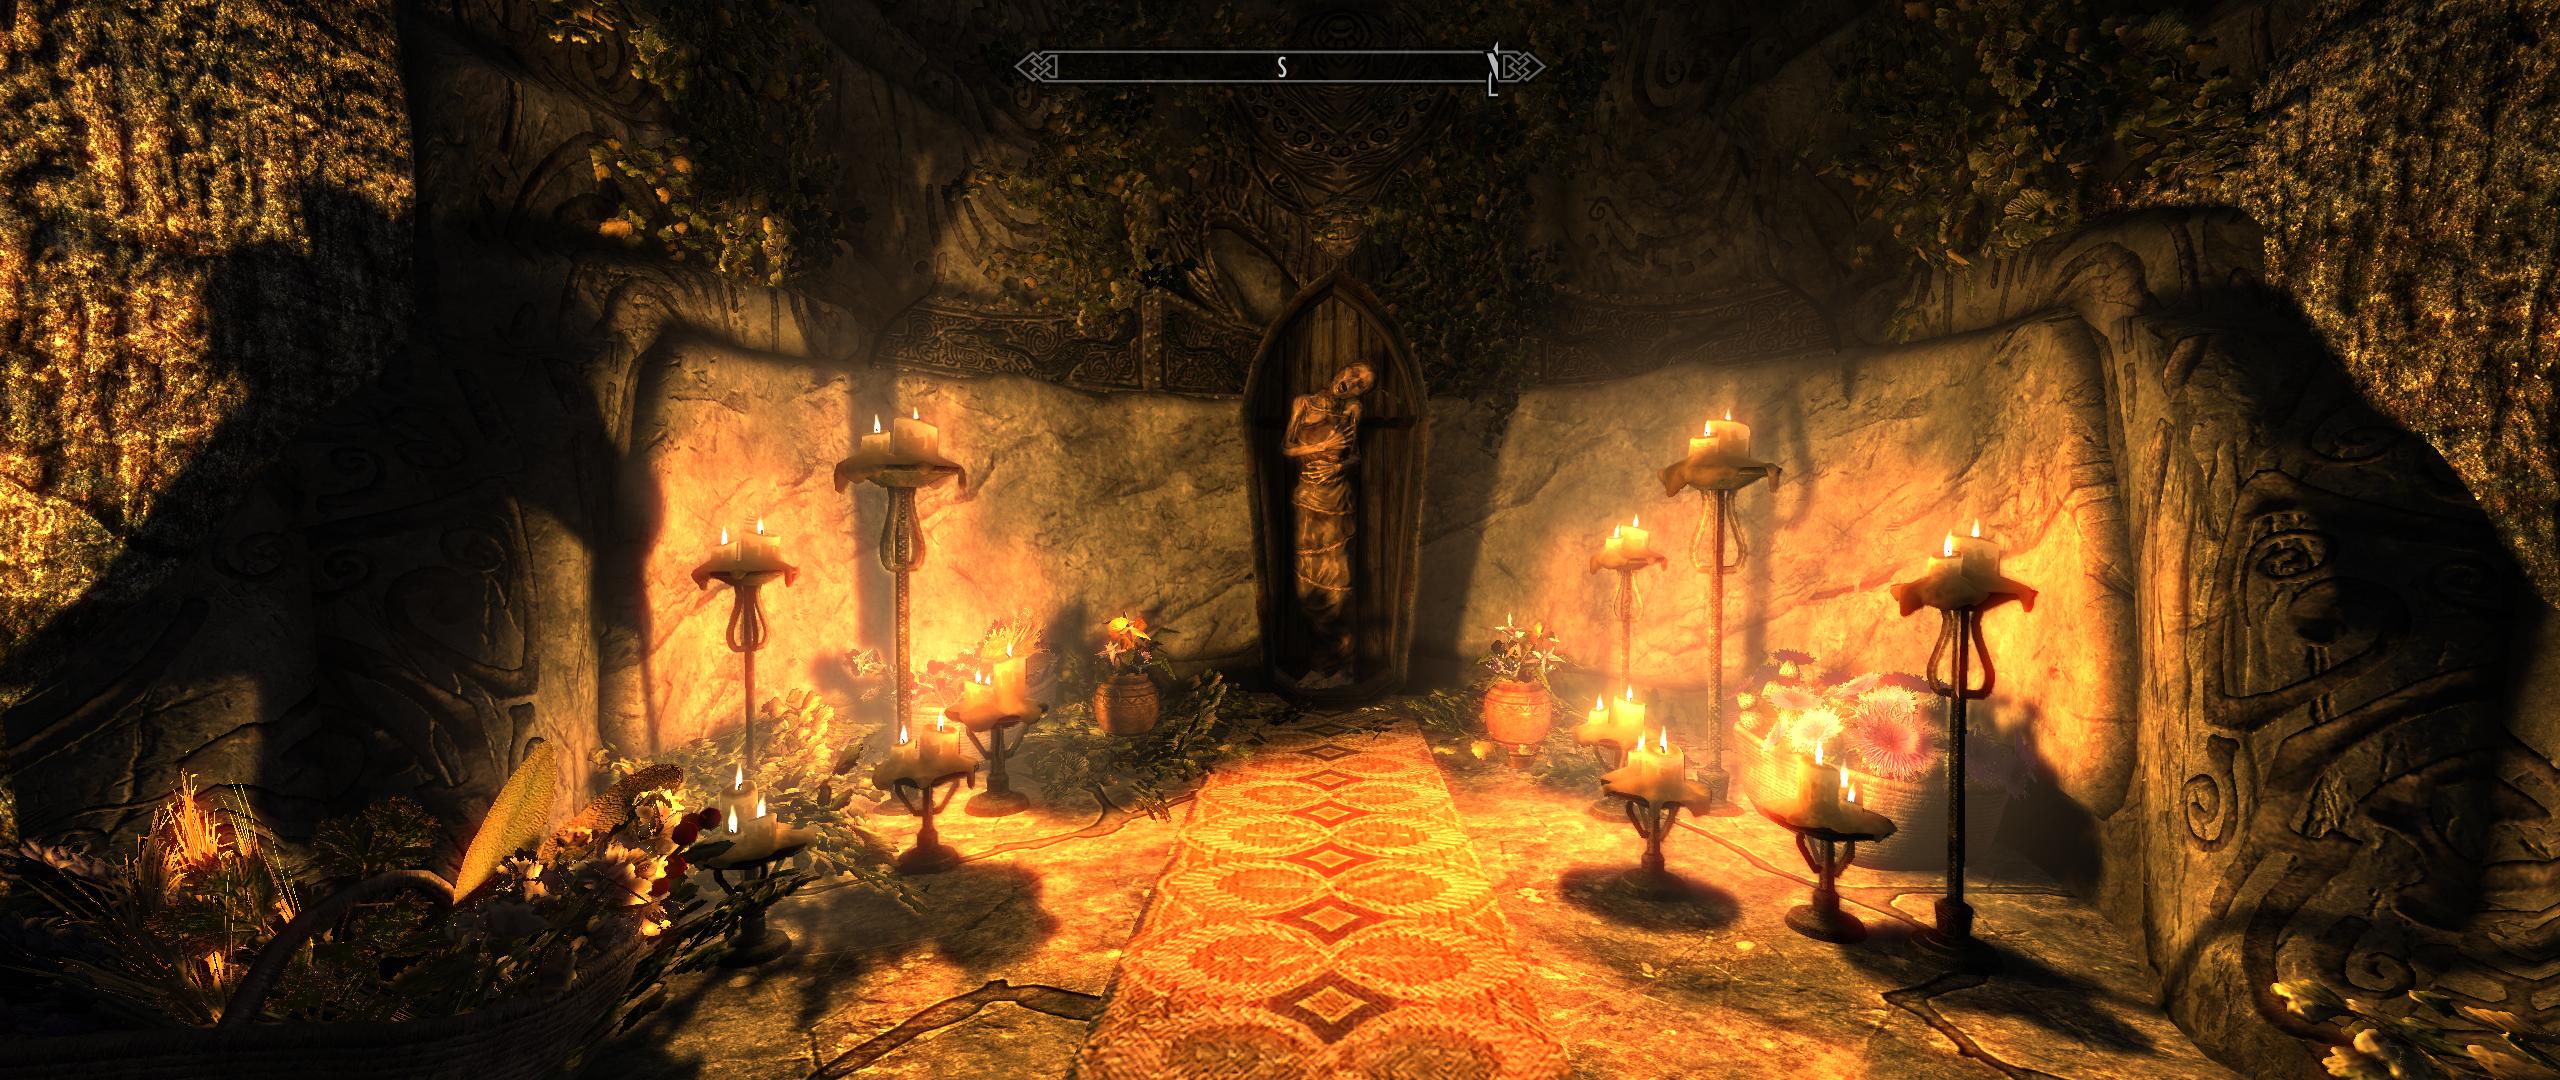 Elder Scrolls V Skyrim - Elder Scrolls 5: Skyrim, the